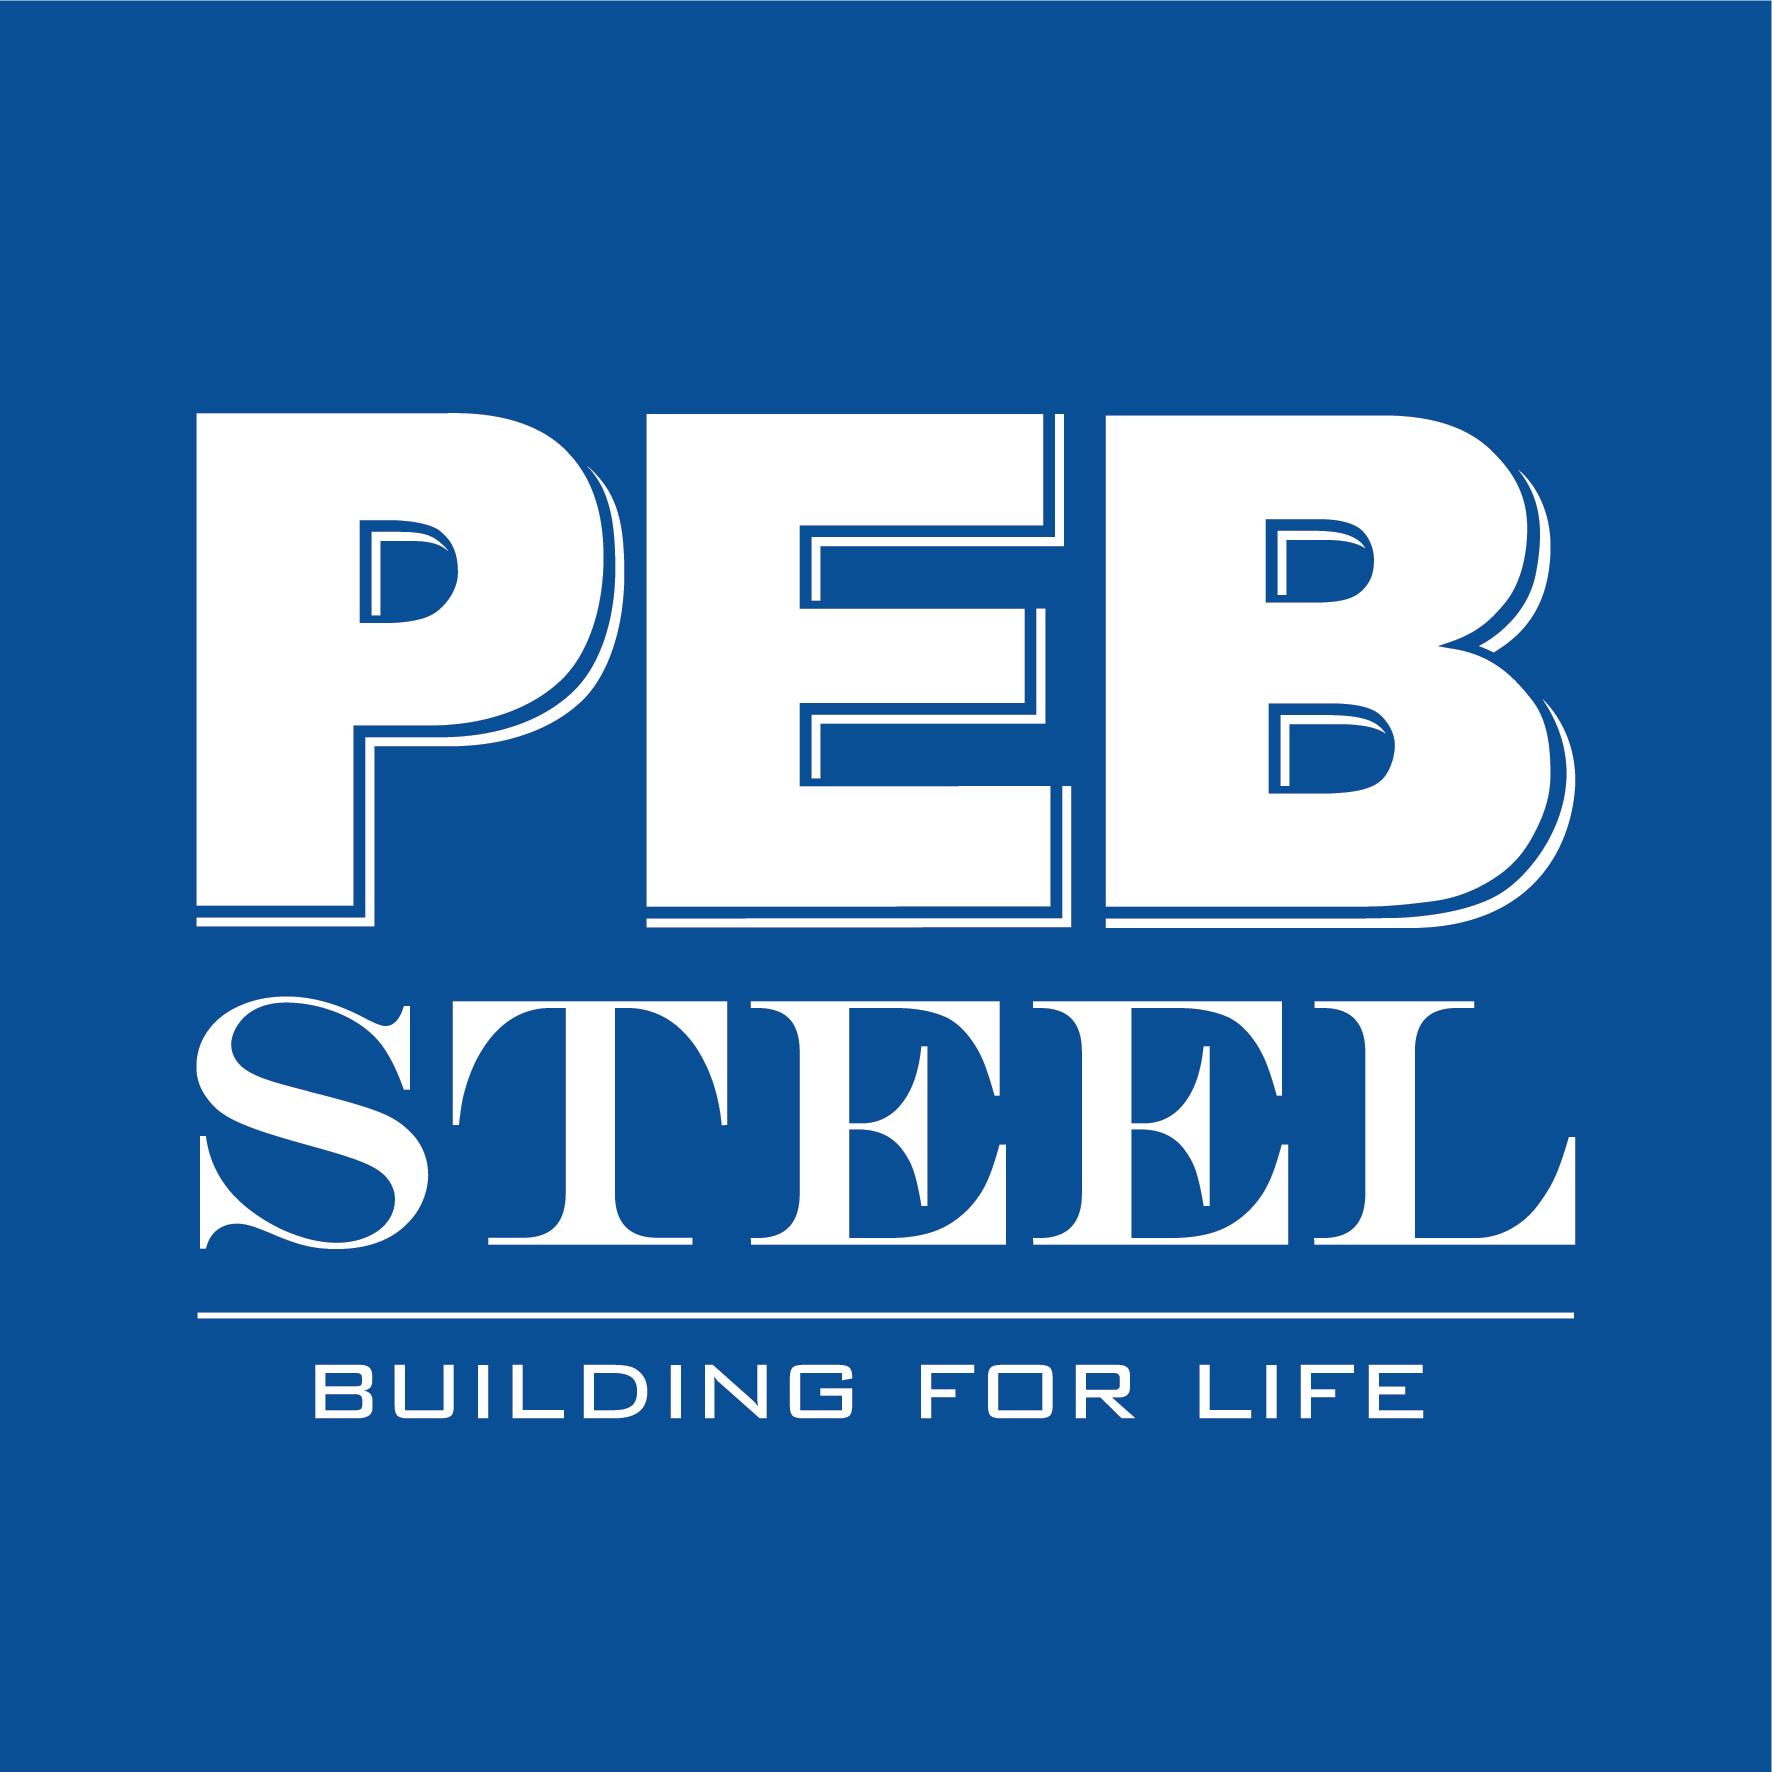 PEB STEEL CO., LTD. CONG TY TNHH THEP PEB